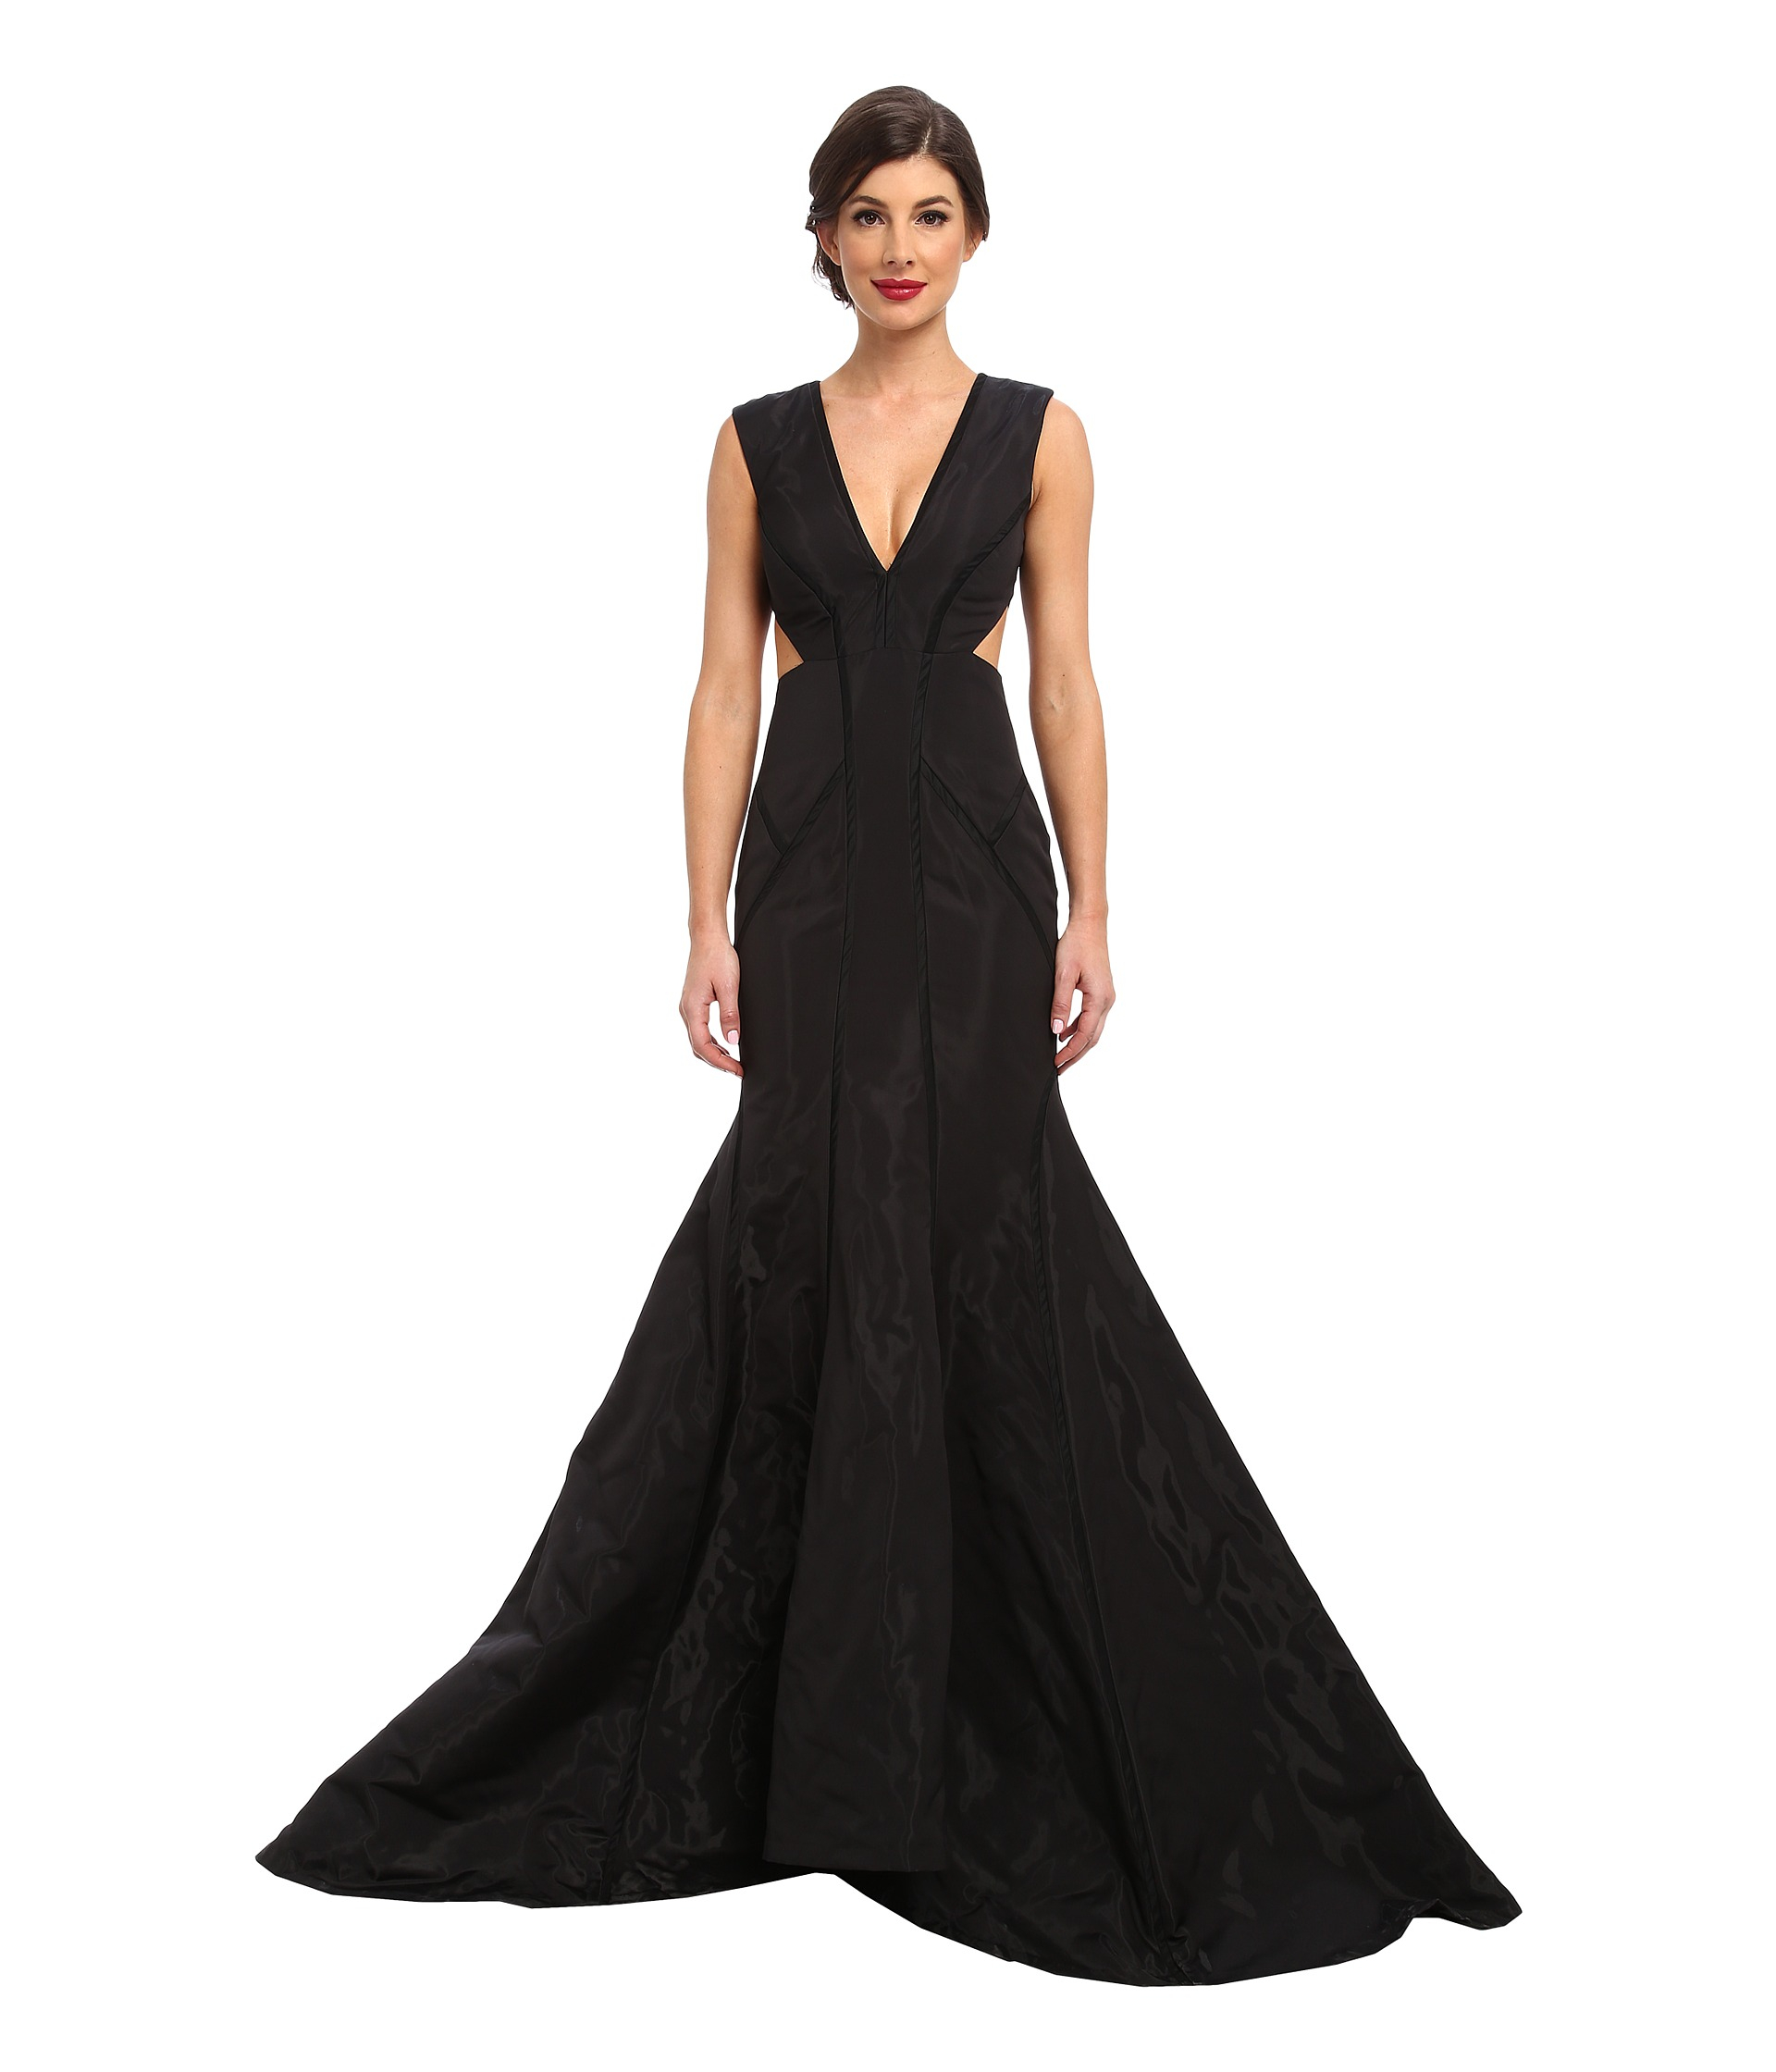 Lyst - Nicole Miller Liquid Vinyl Dress in Black